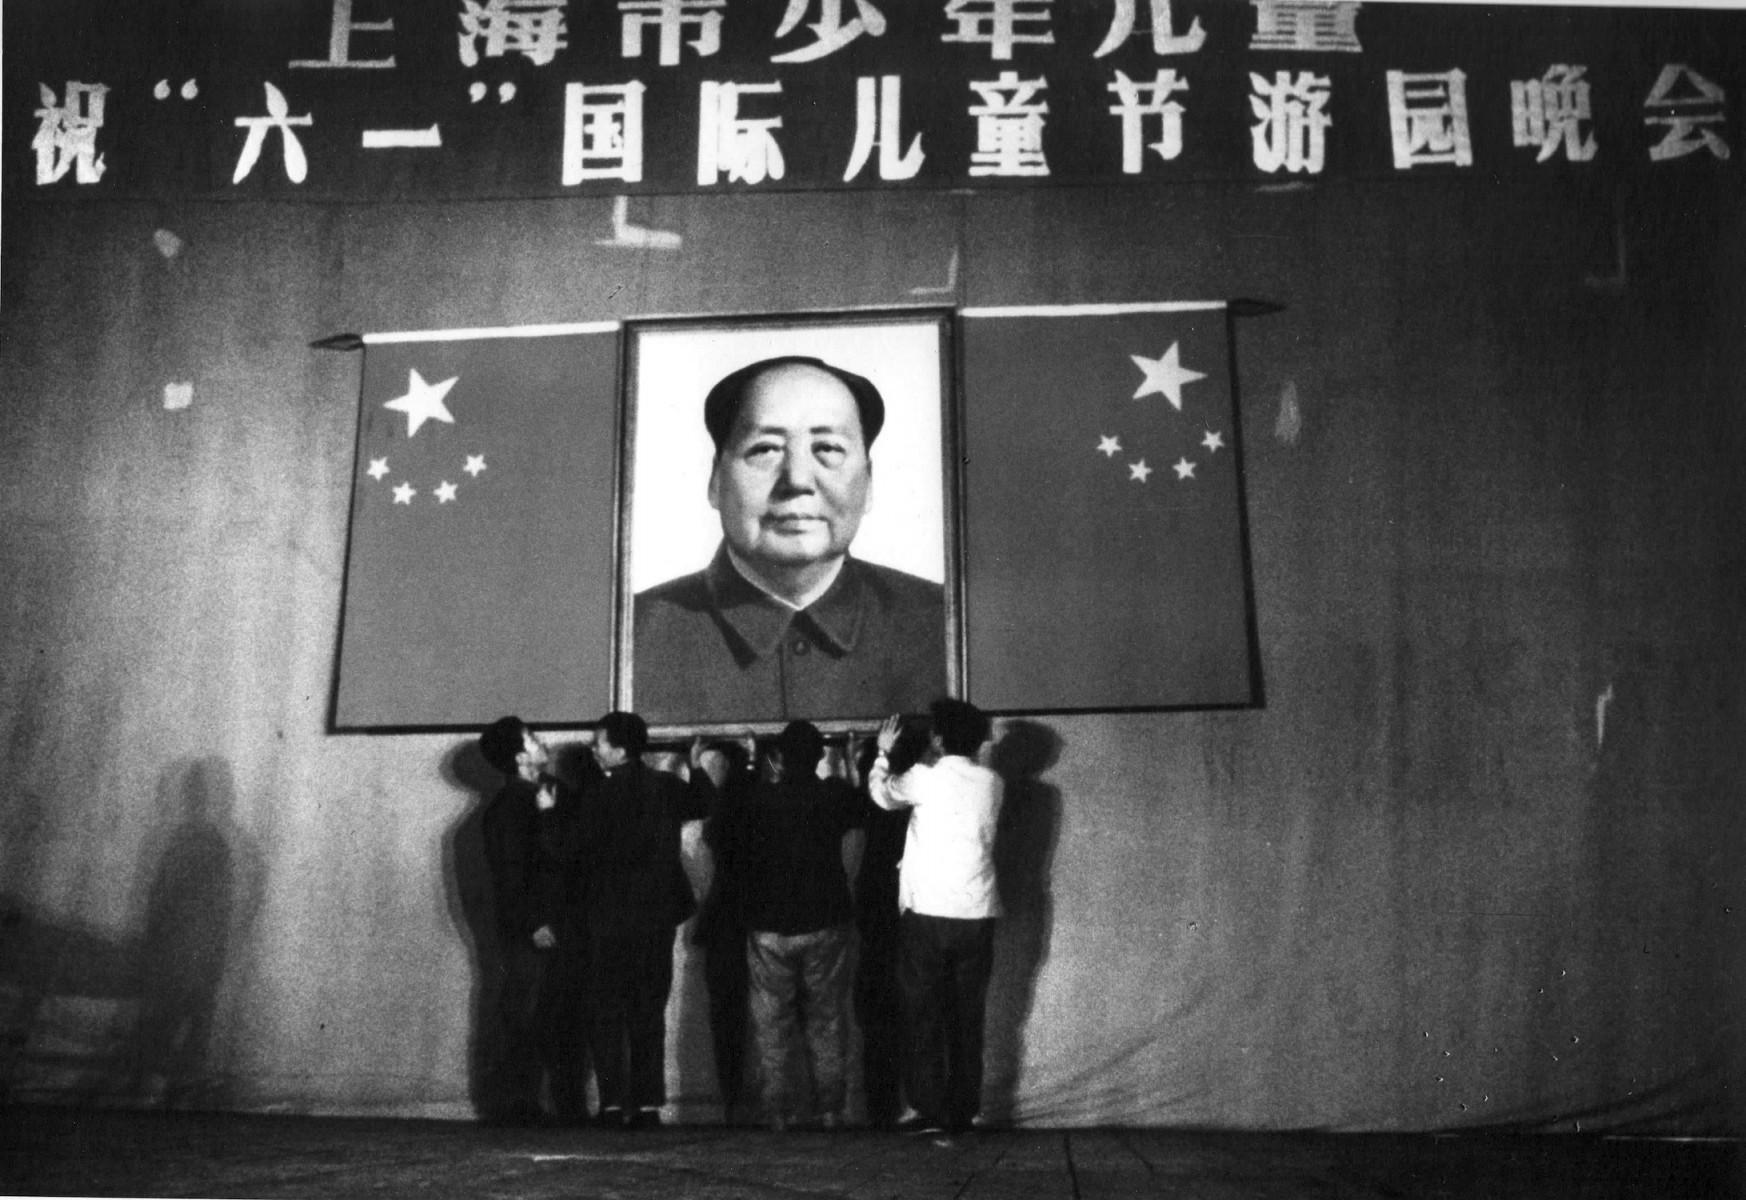 Mao Poster in Shanghai, 1973